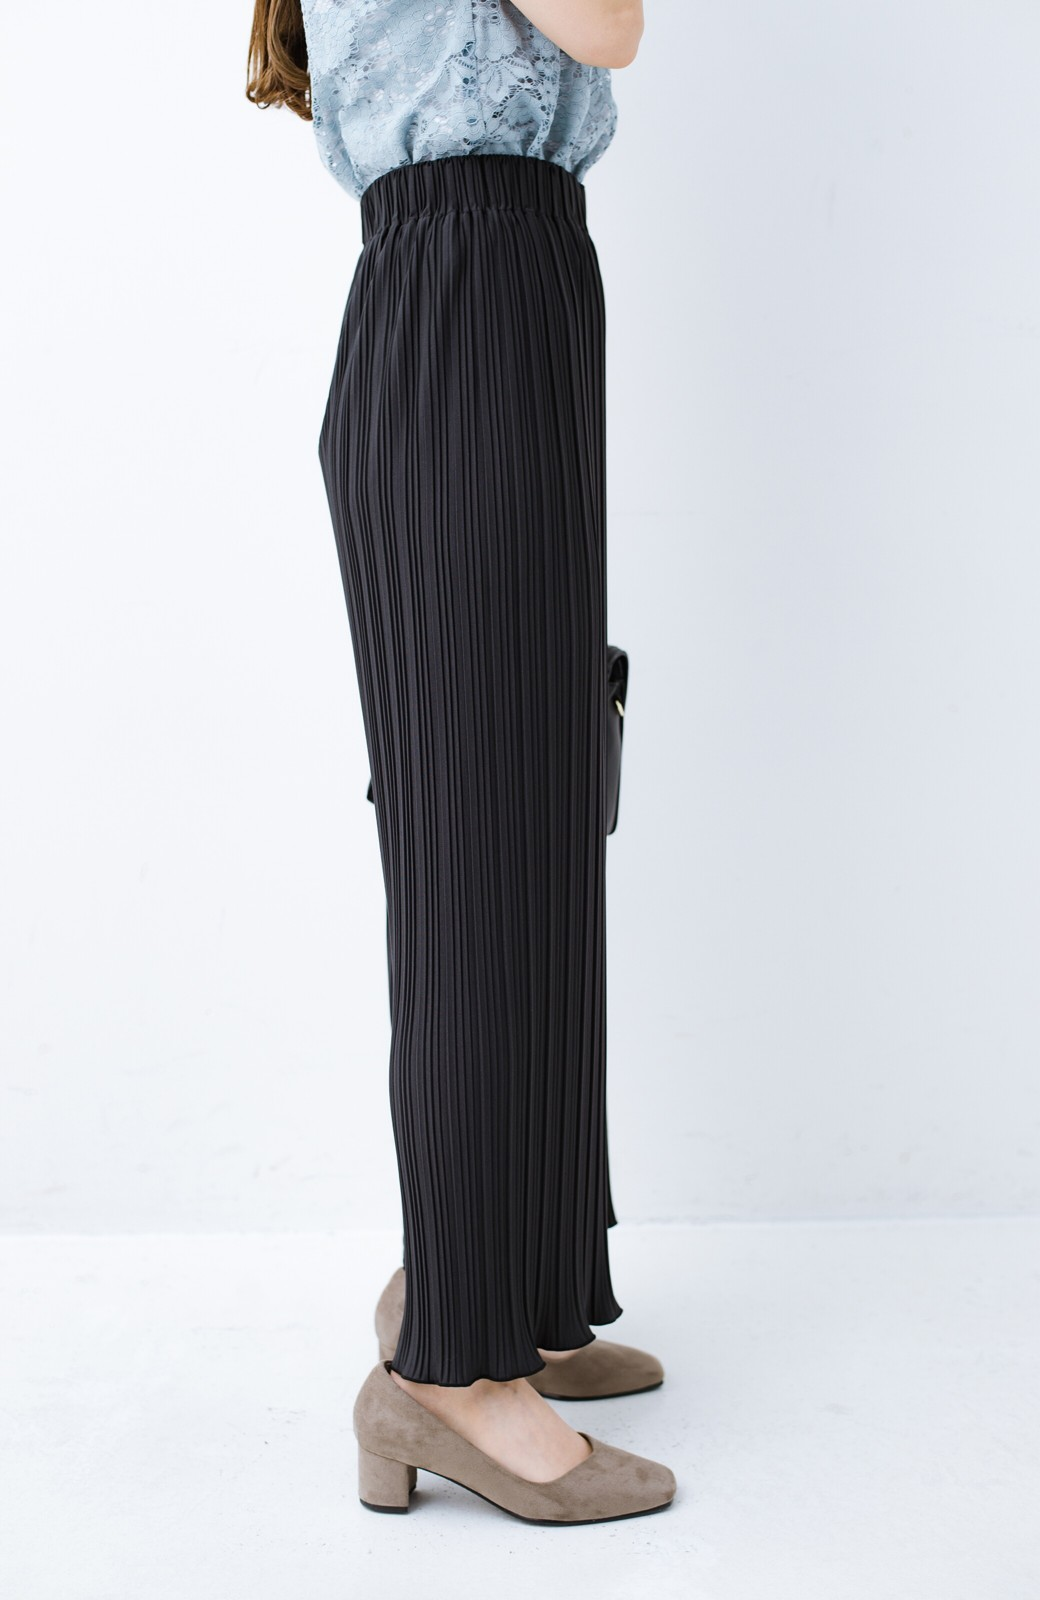 haco! パンツ派さんのデートにもカジュアル派さんの重ね着にも便利なプリーツパンツ  <チャコールグレー>の商品写真5